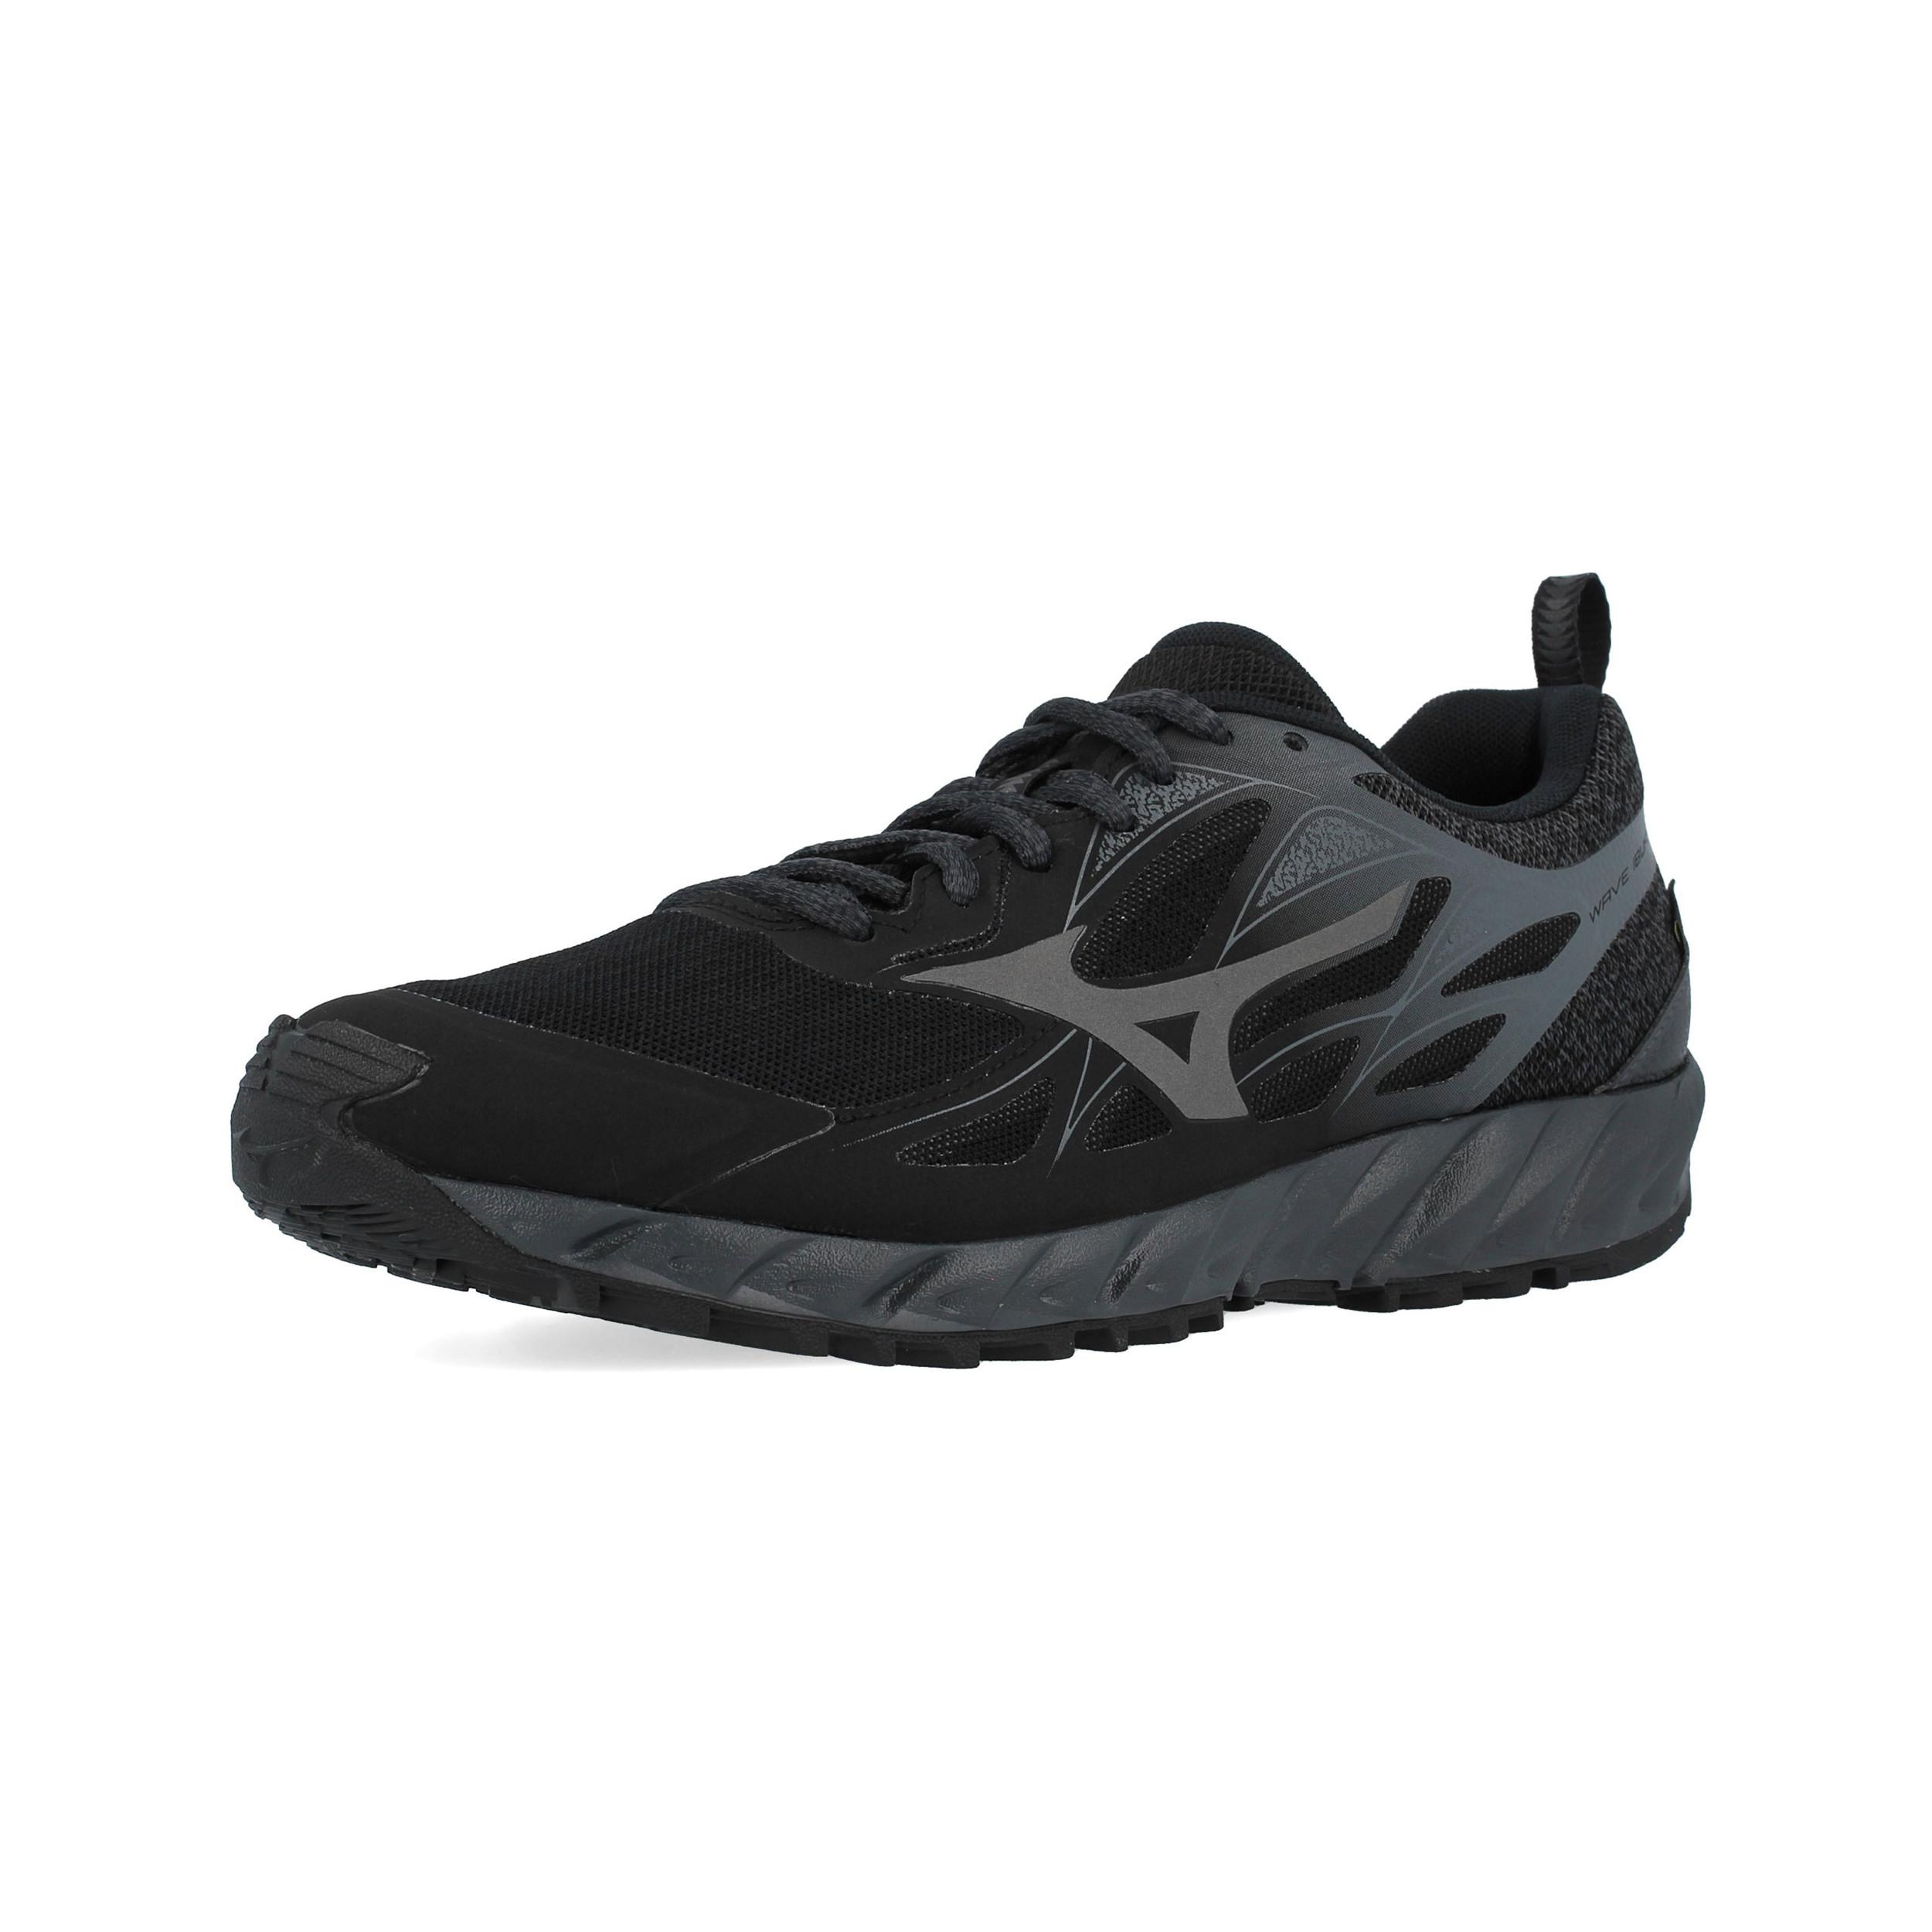 Mizuno-da-uomo-Wave-Ibuki-GORE-TEX-TRAIL-RUNNING-scarpe-da-ginnastica-Black miniatura 8